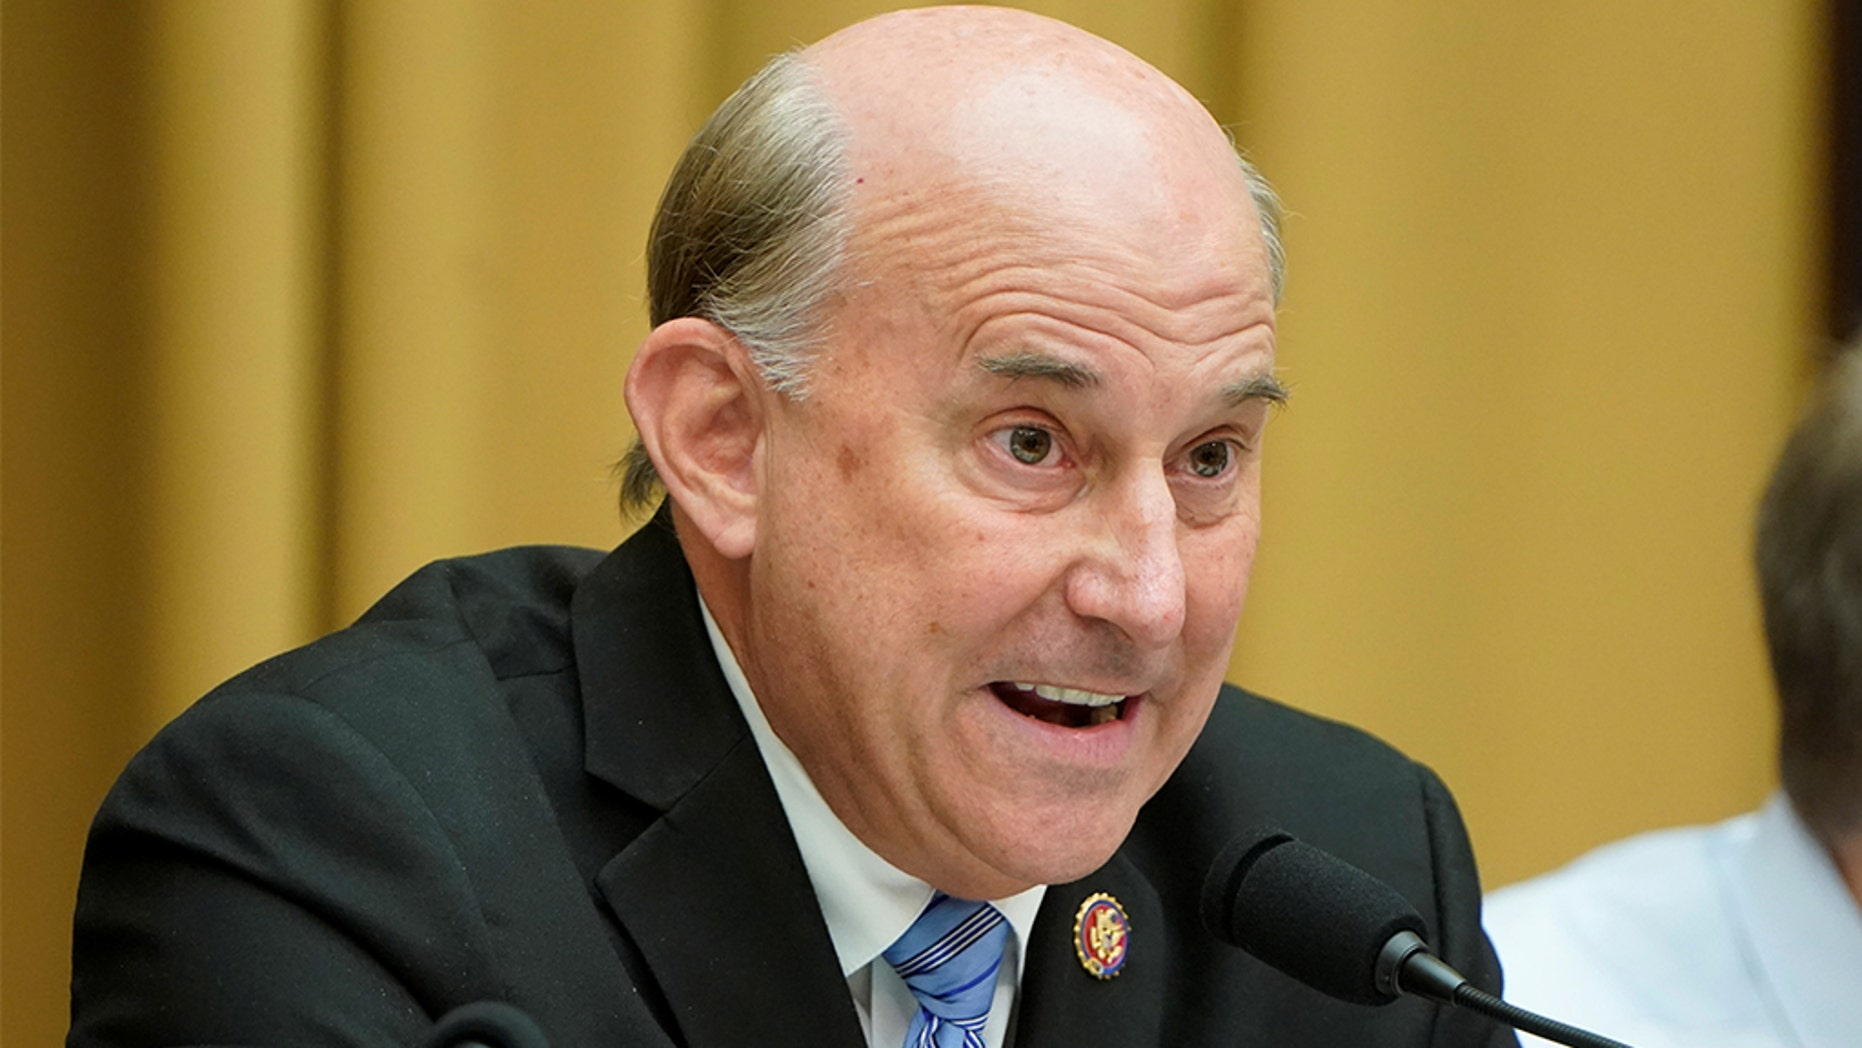 U.S. Rep. Louie Gohmert, R-Texas. REUTERS/Joshua Roberts